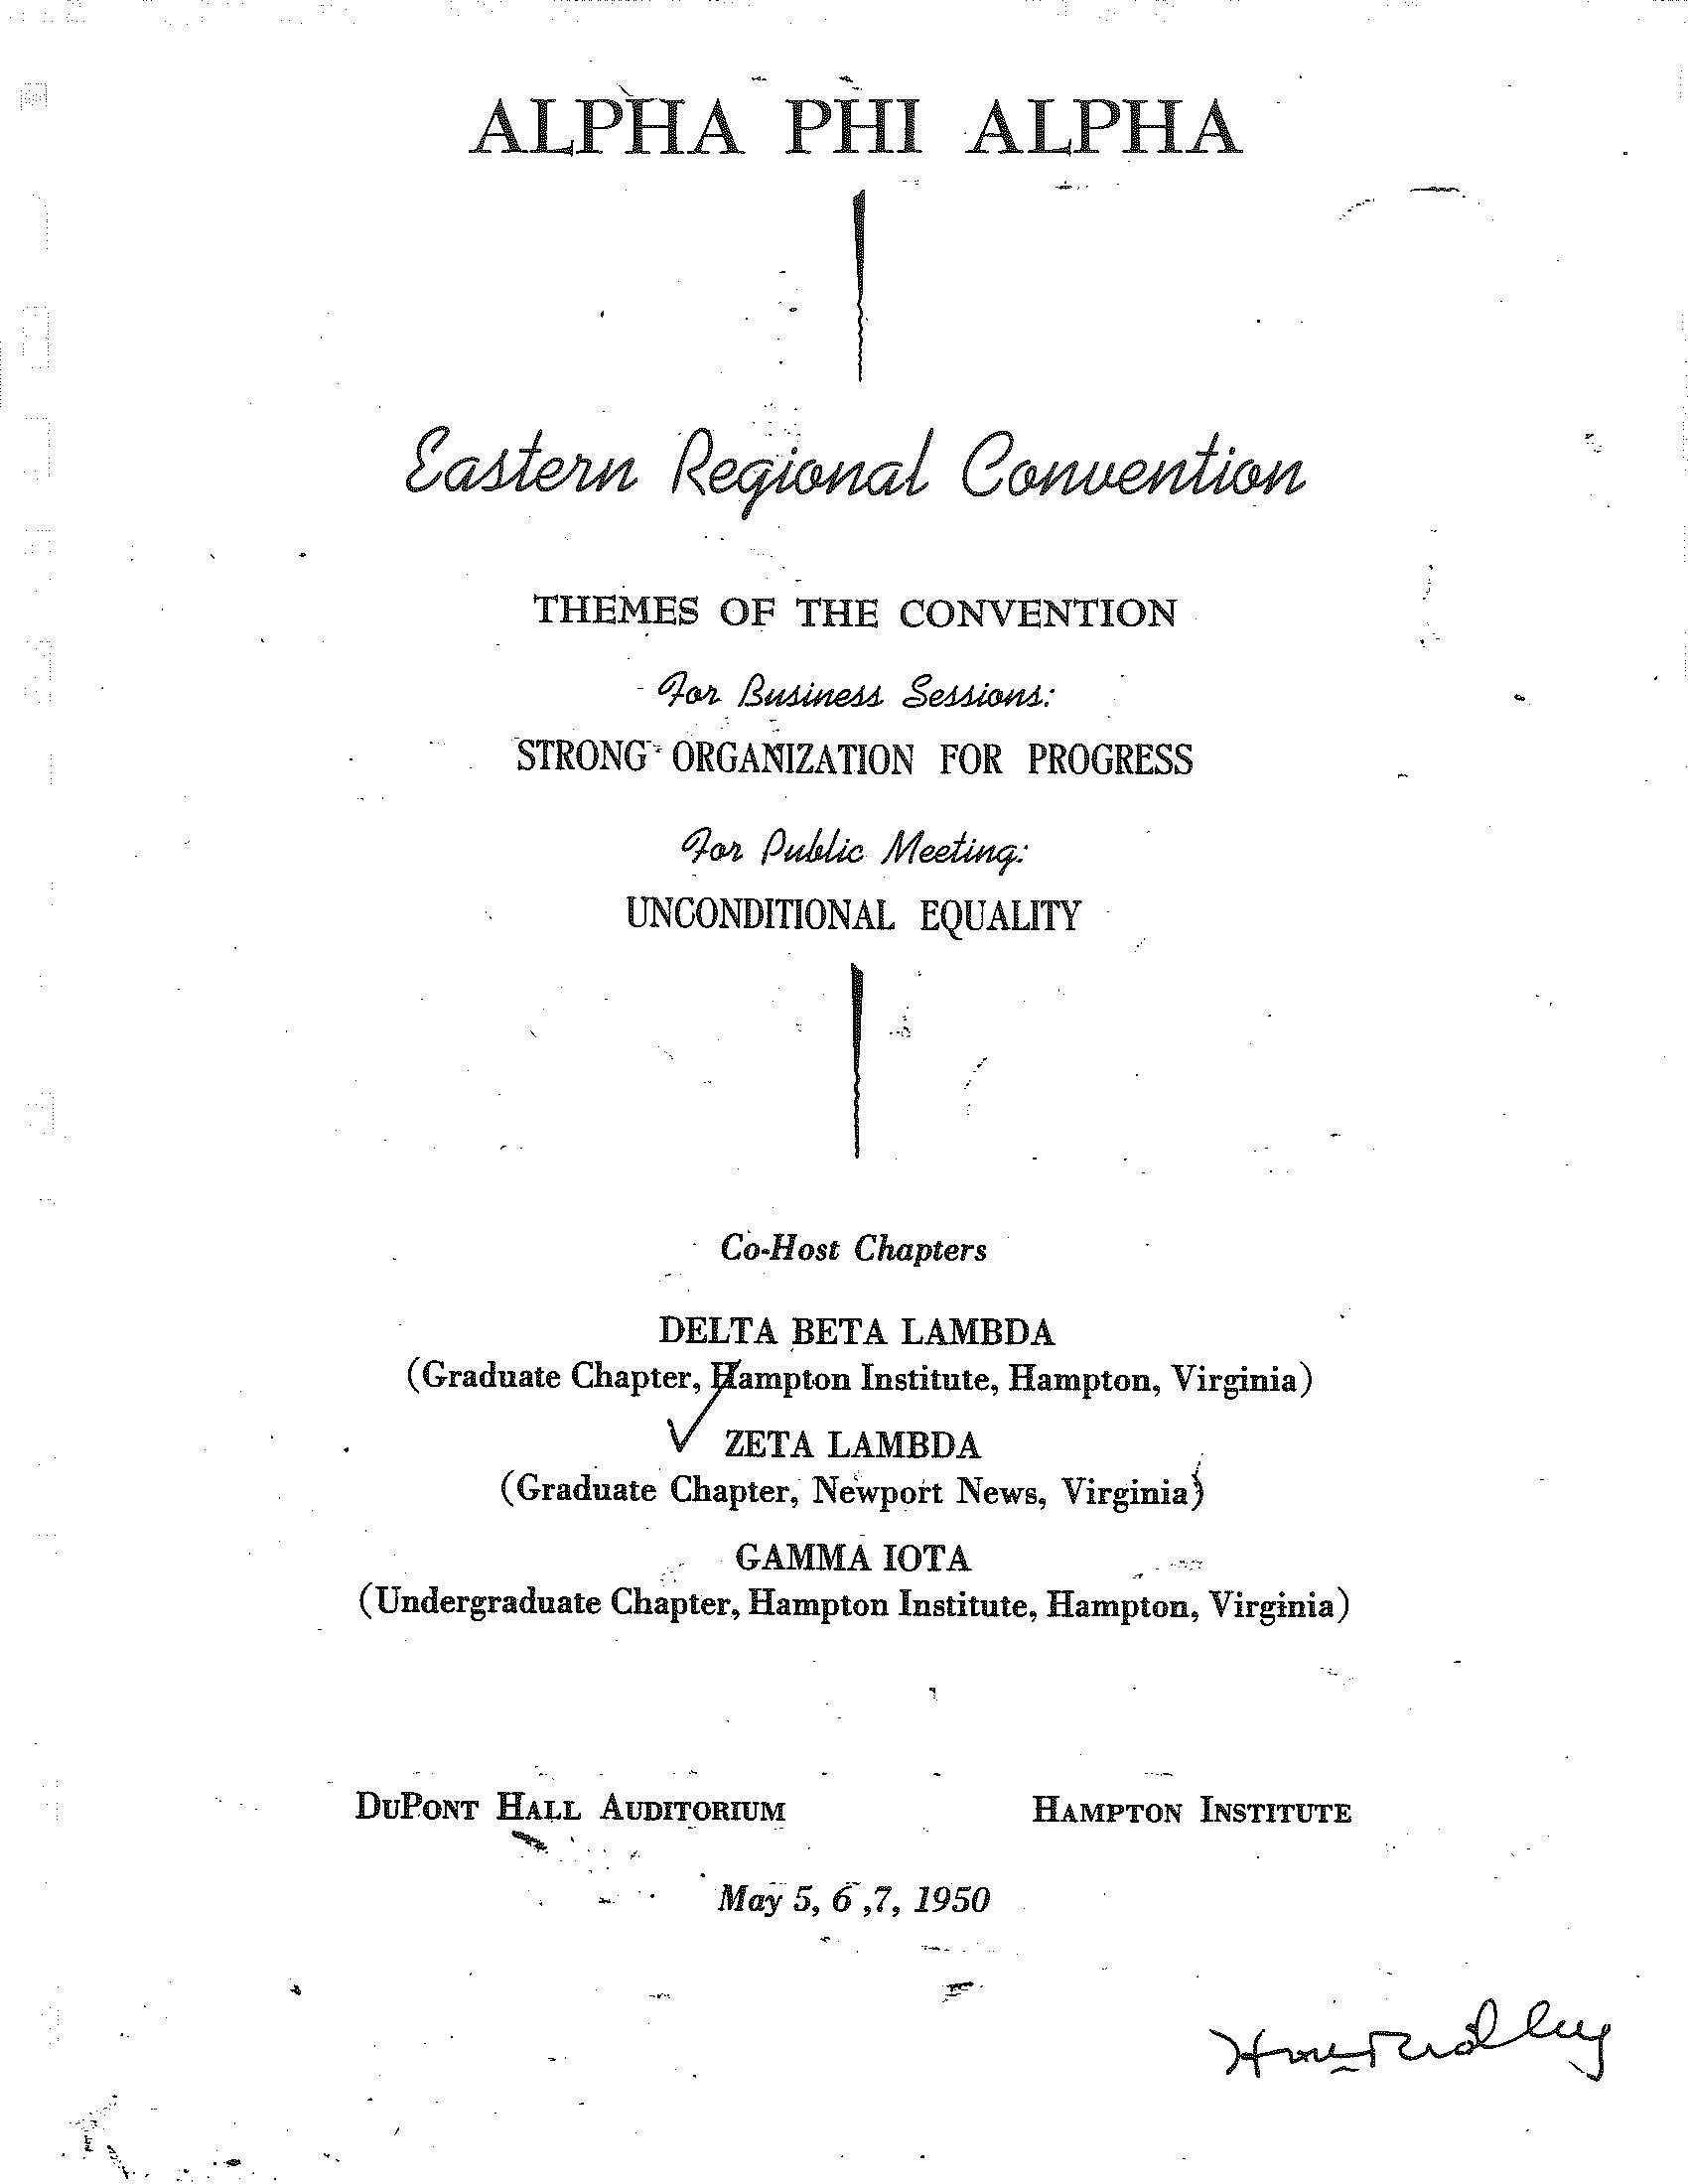 Zeta Lambda 1950 - Eastern Region Convention.png